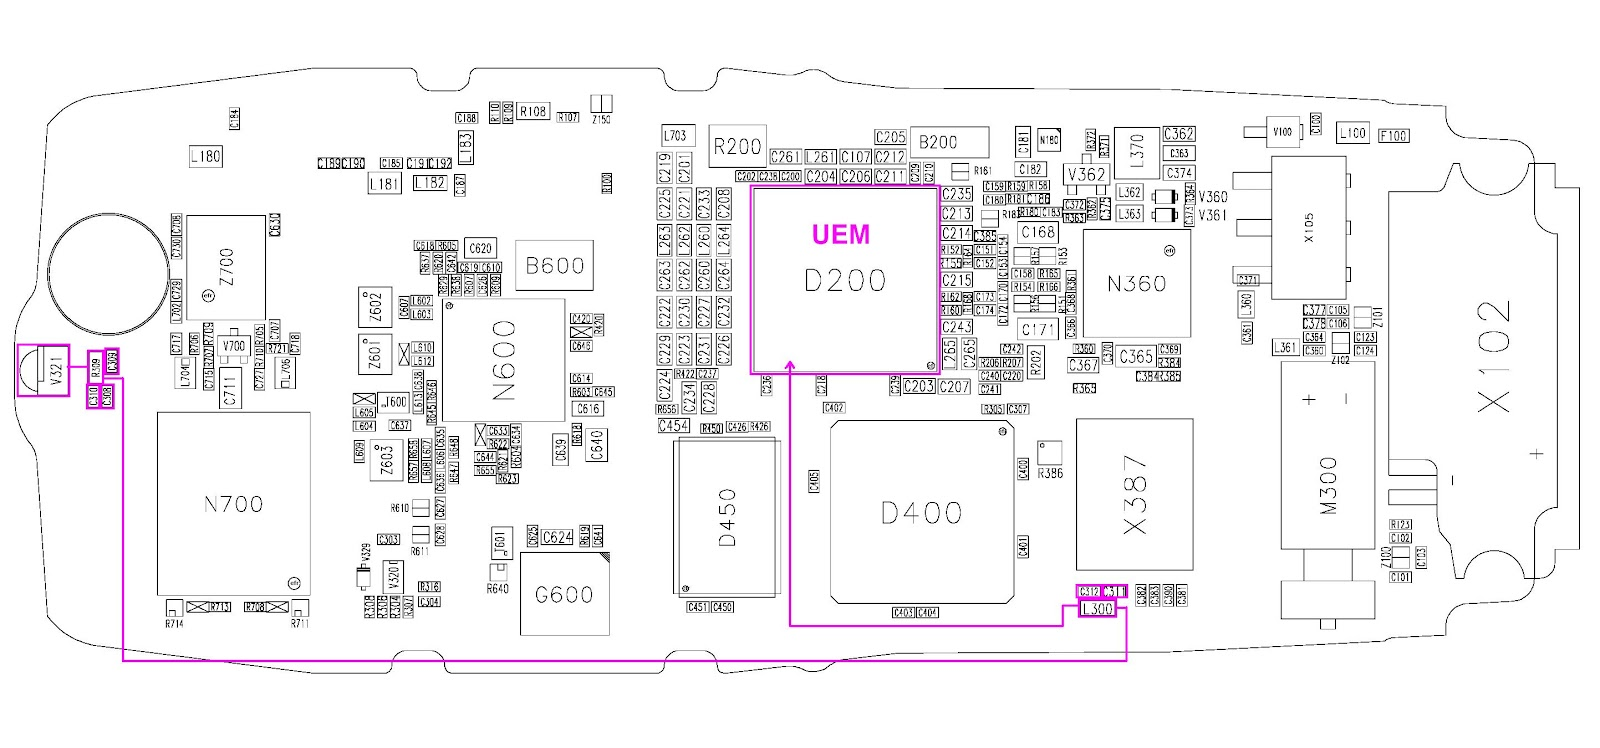 circuit diagram nokia 1100 wiring diagram mega circuit diagram nokia 1100 [ 1600 x 748 Pixel ]